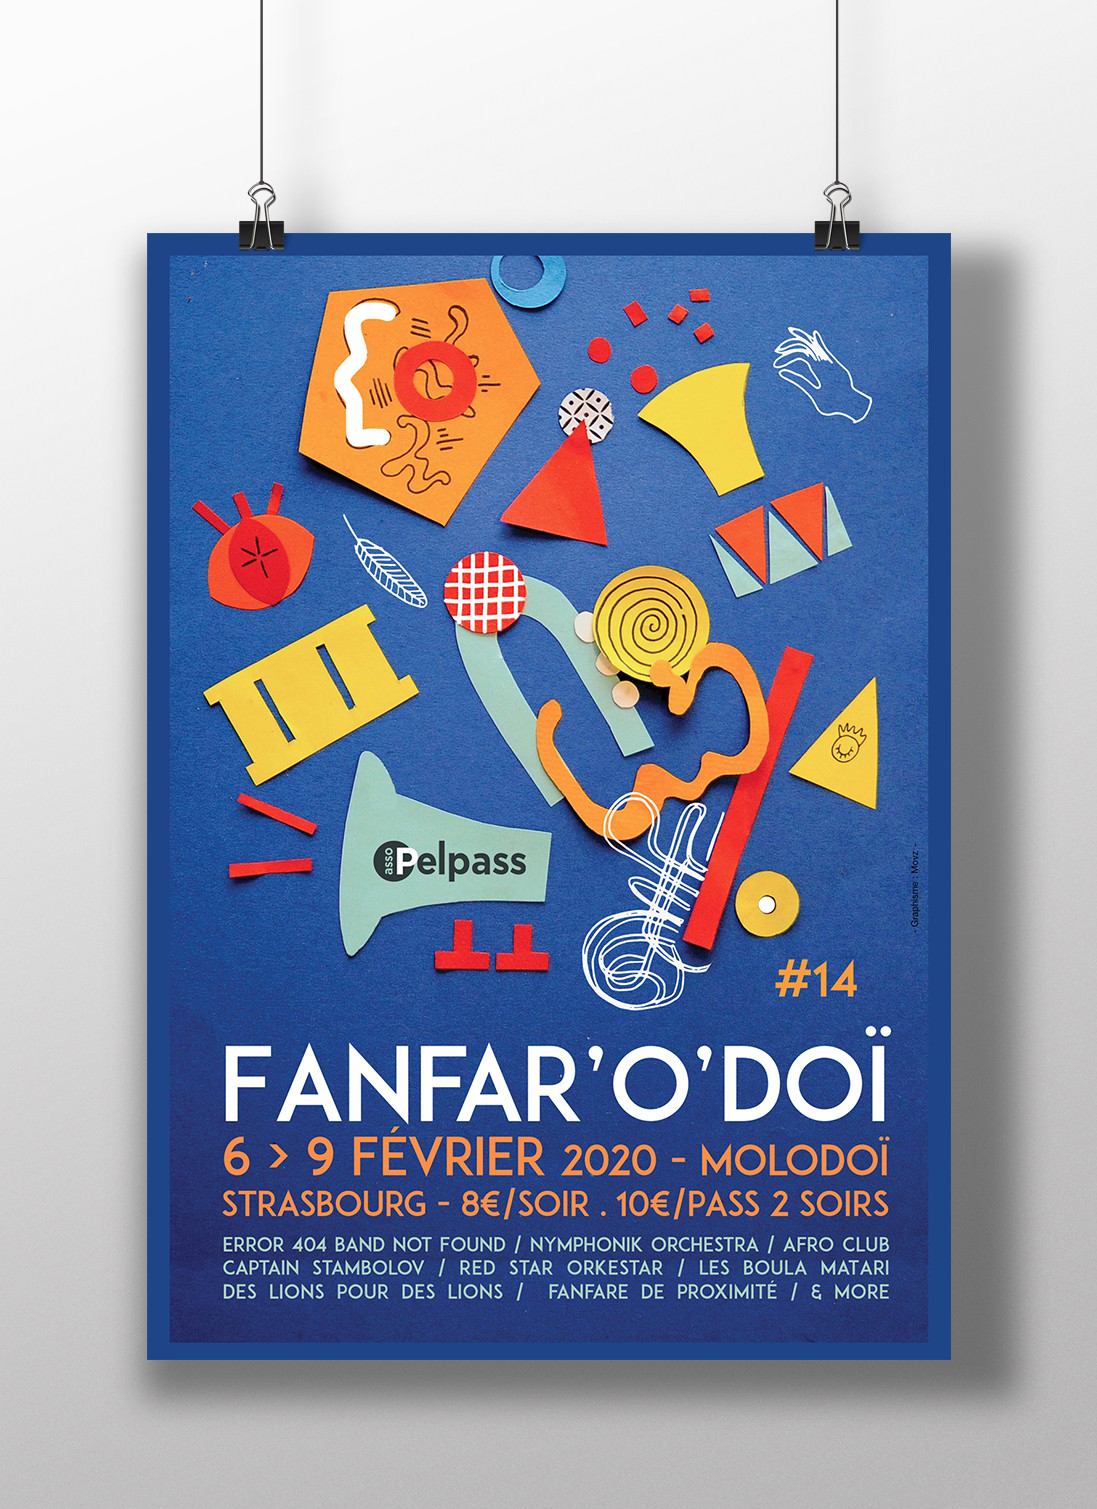 poster_mockup_fanfarodoi2.jpg